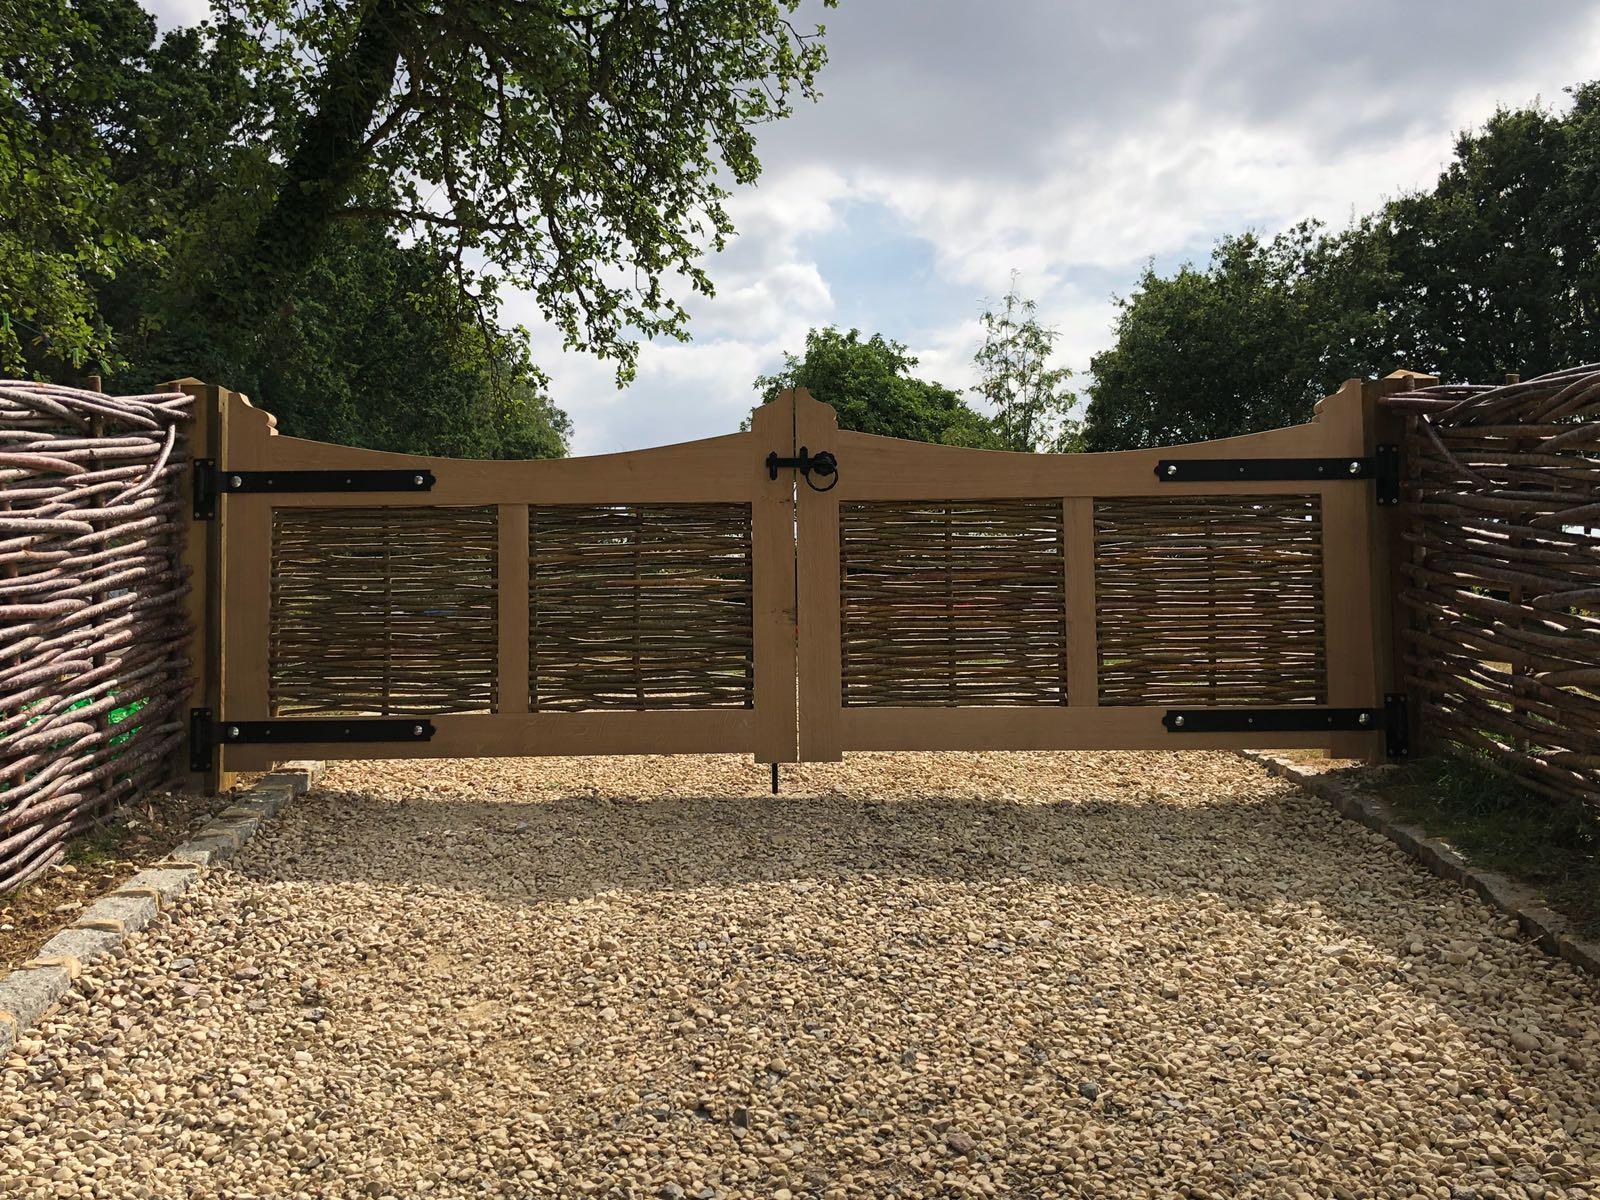 Bespoke woven gates by WonderWood